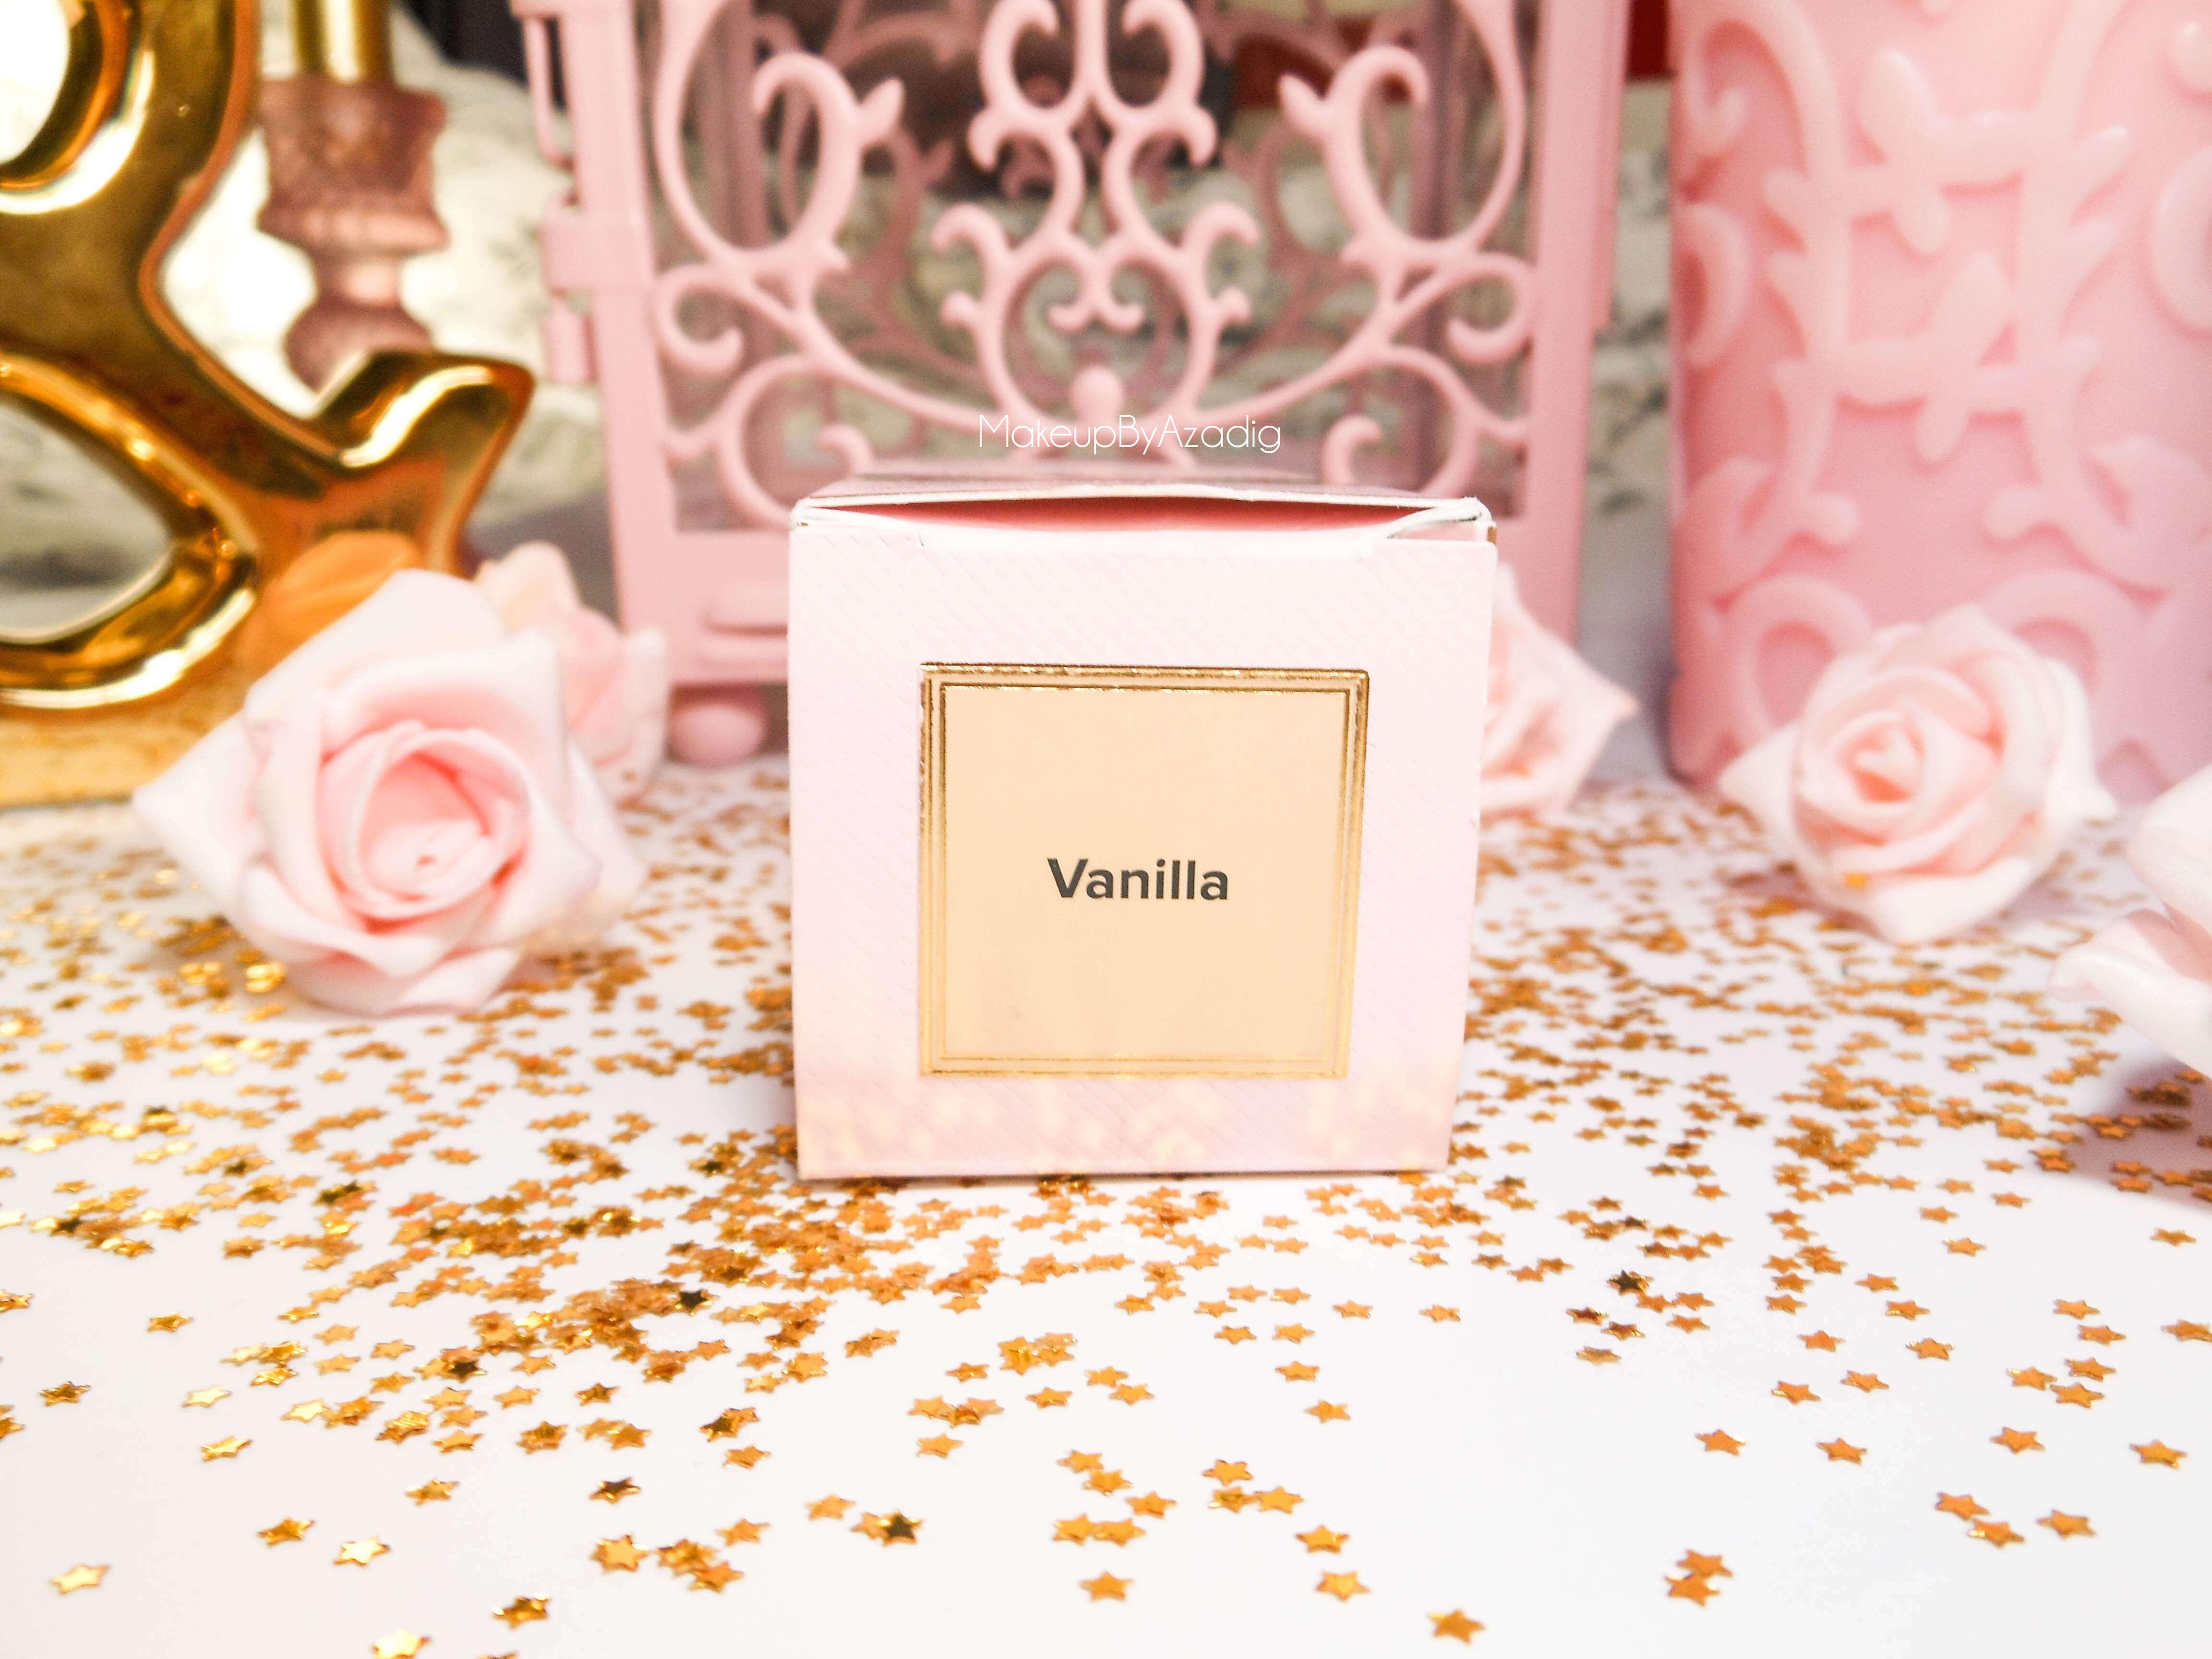 makeupbyazadig-too-faced-fond-de-teint-born-this-way-blog-vanilla